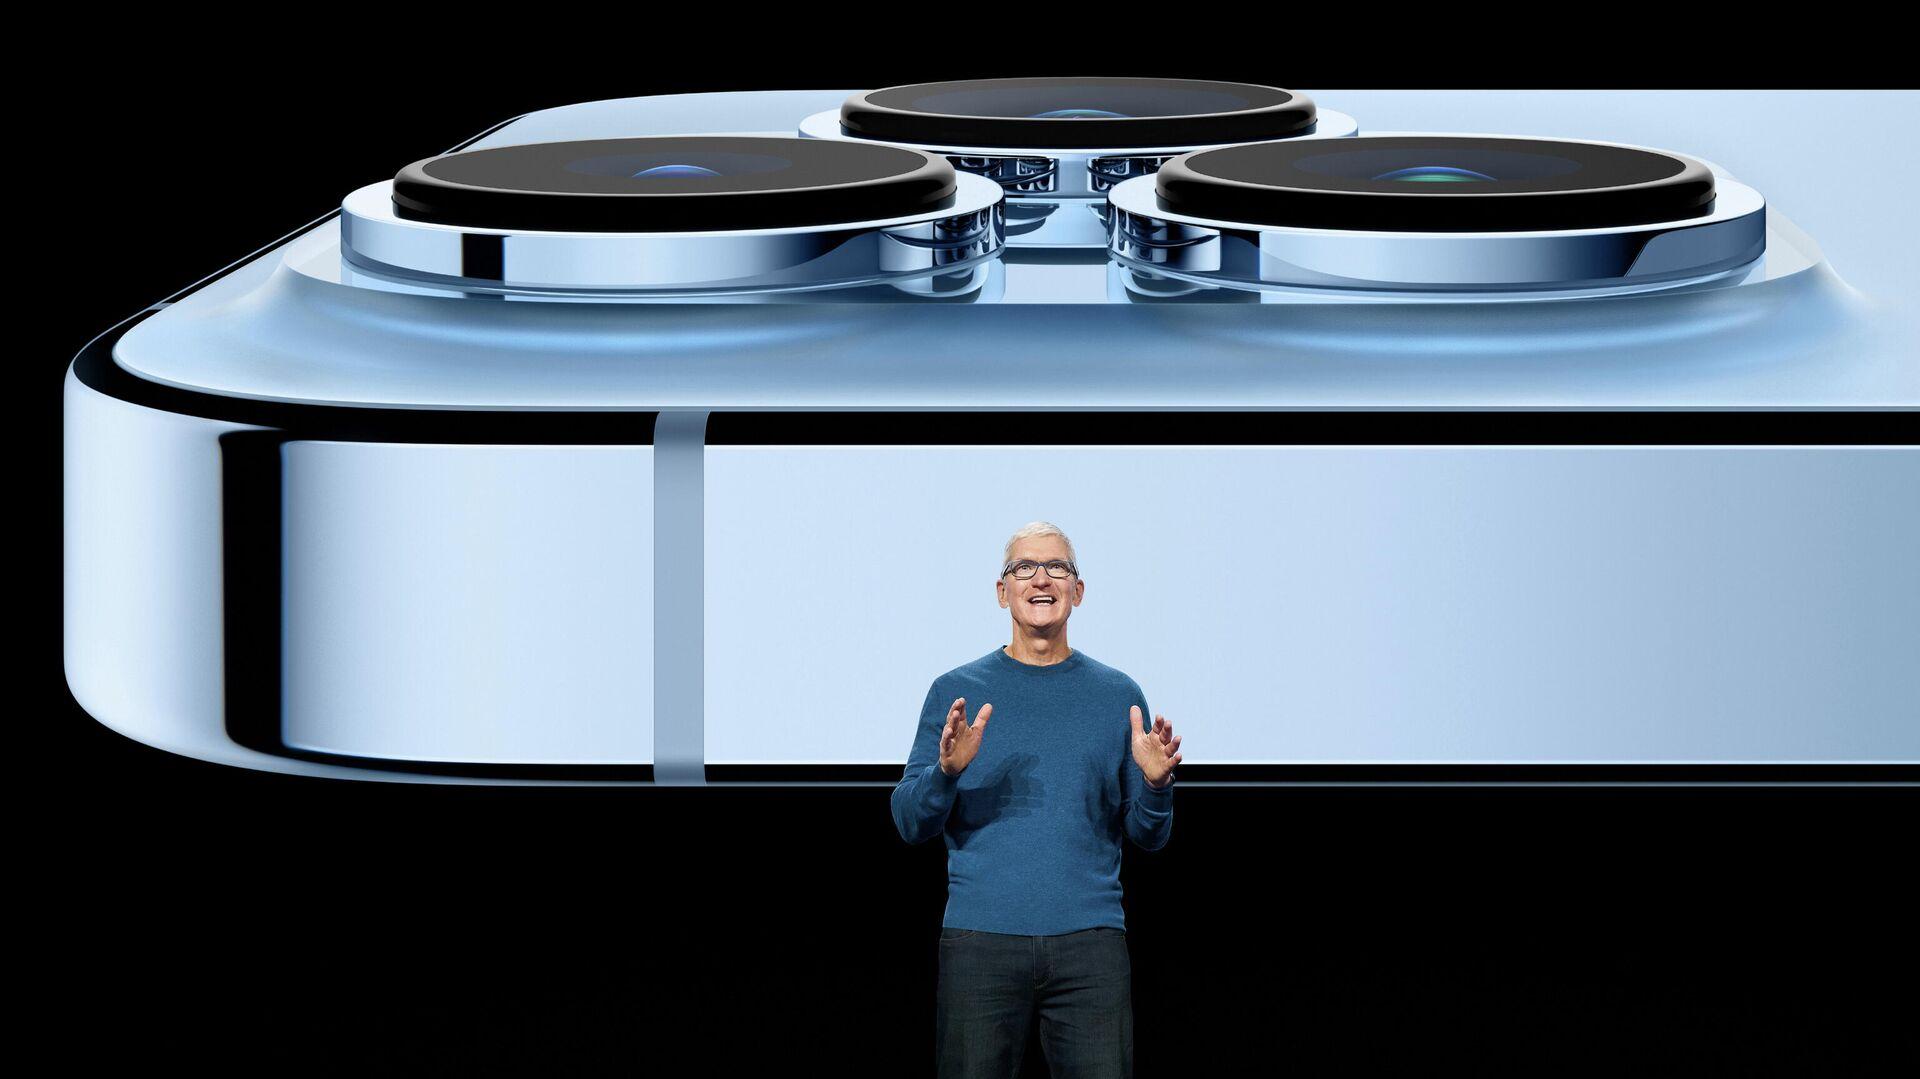 Презентация iPhone 13 в штаб-квартире компании Apple в Купертино, Калифорния - РИА Новости, 1920, 15.09.2021